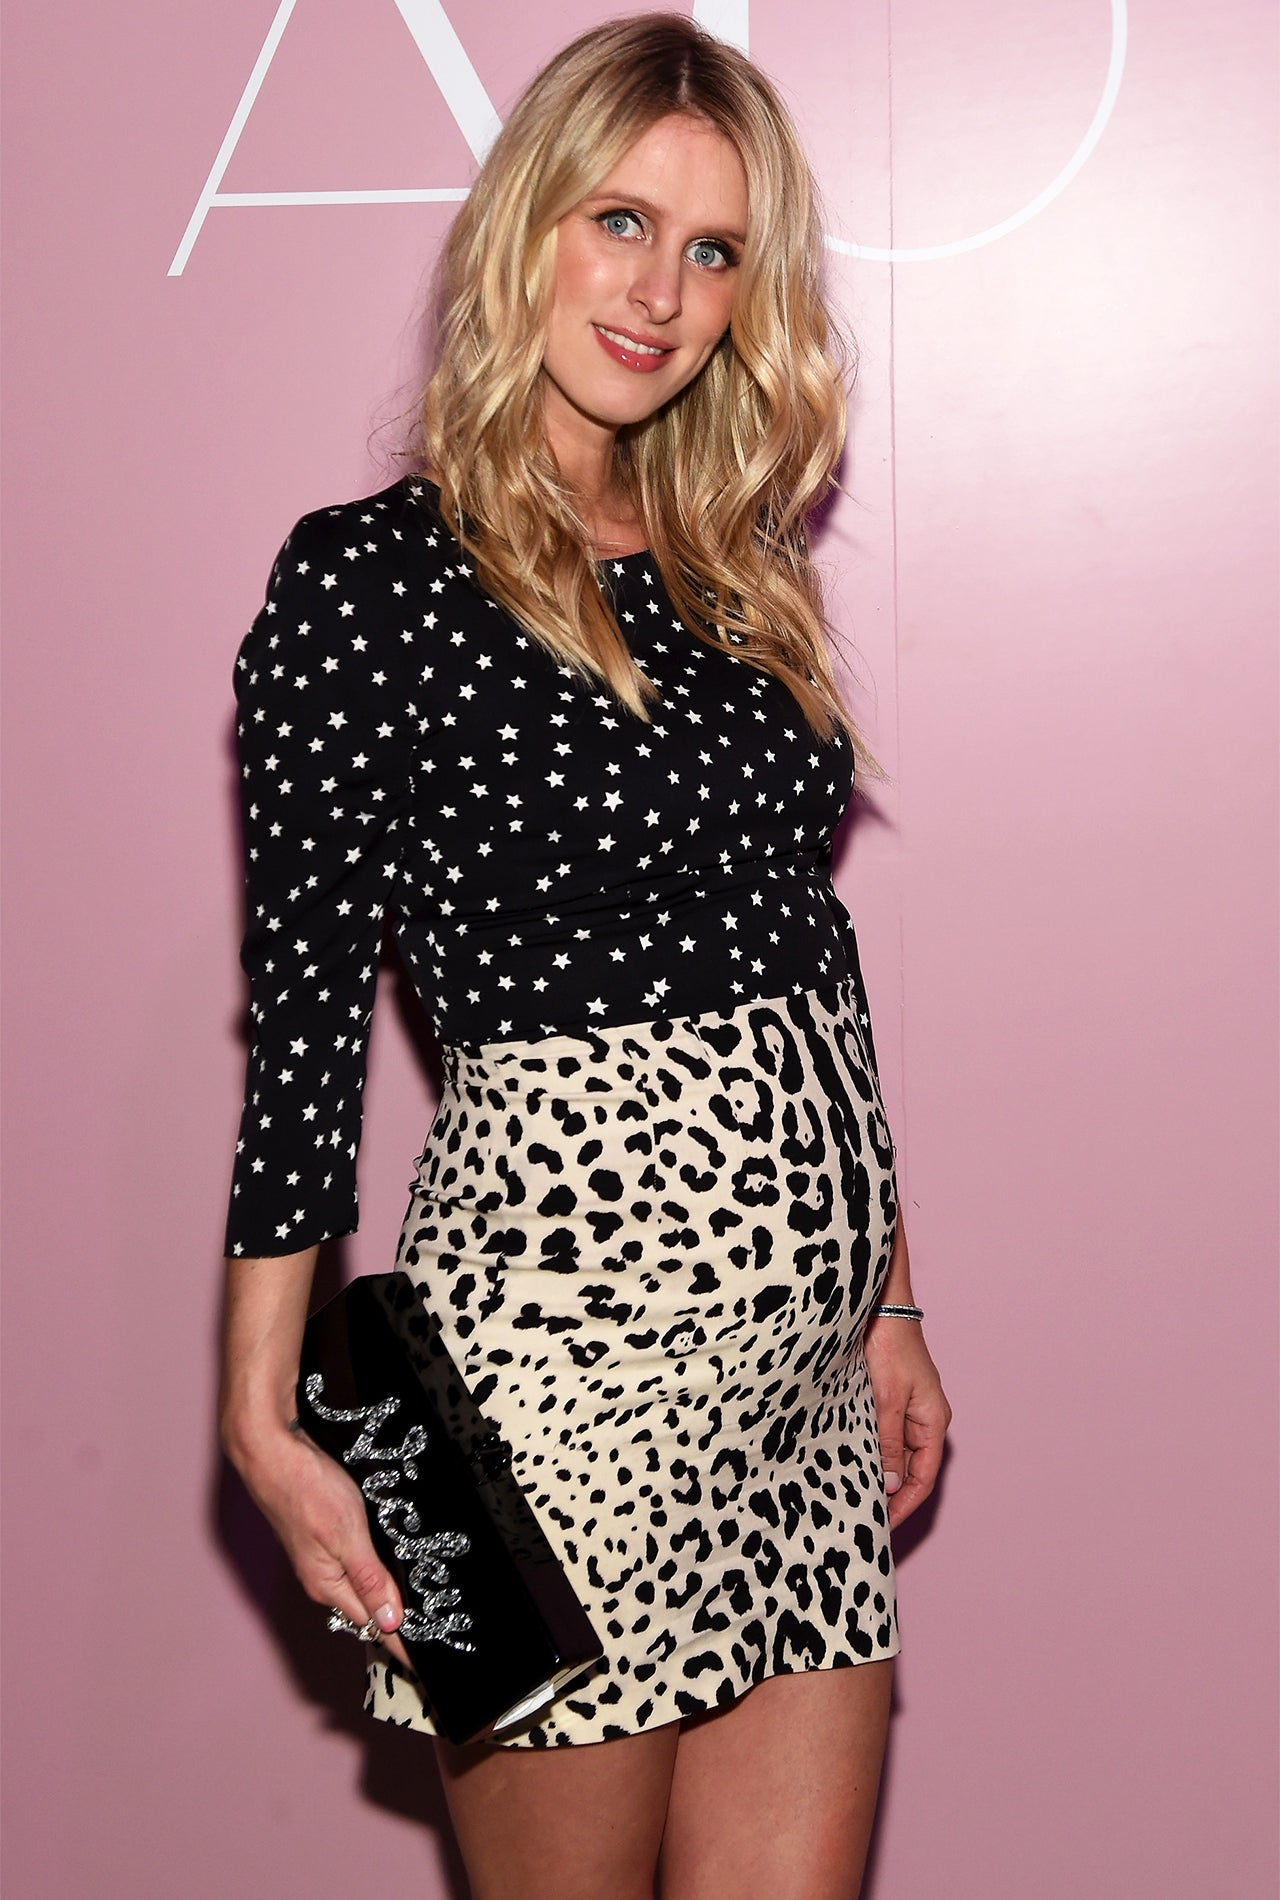 Maternity Dresses For A Wedding 49 Elegant Nicky Hilton Turns uDolce